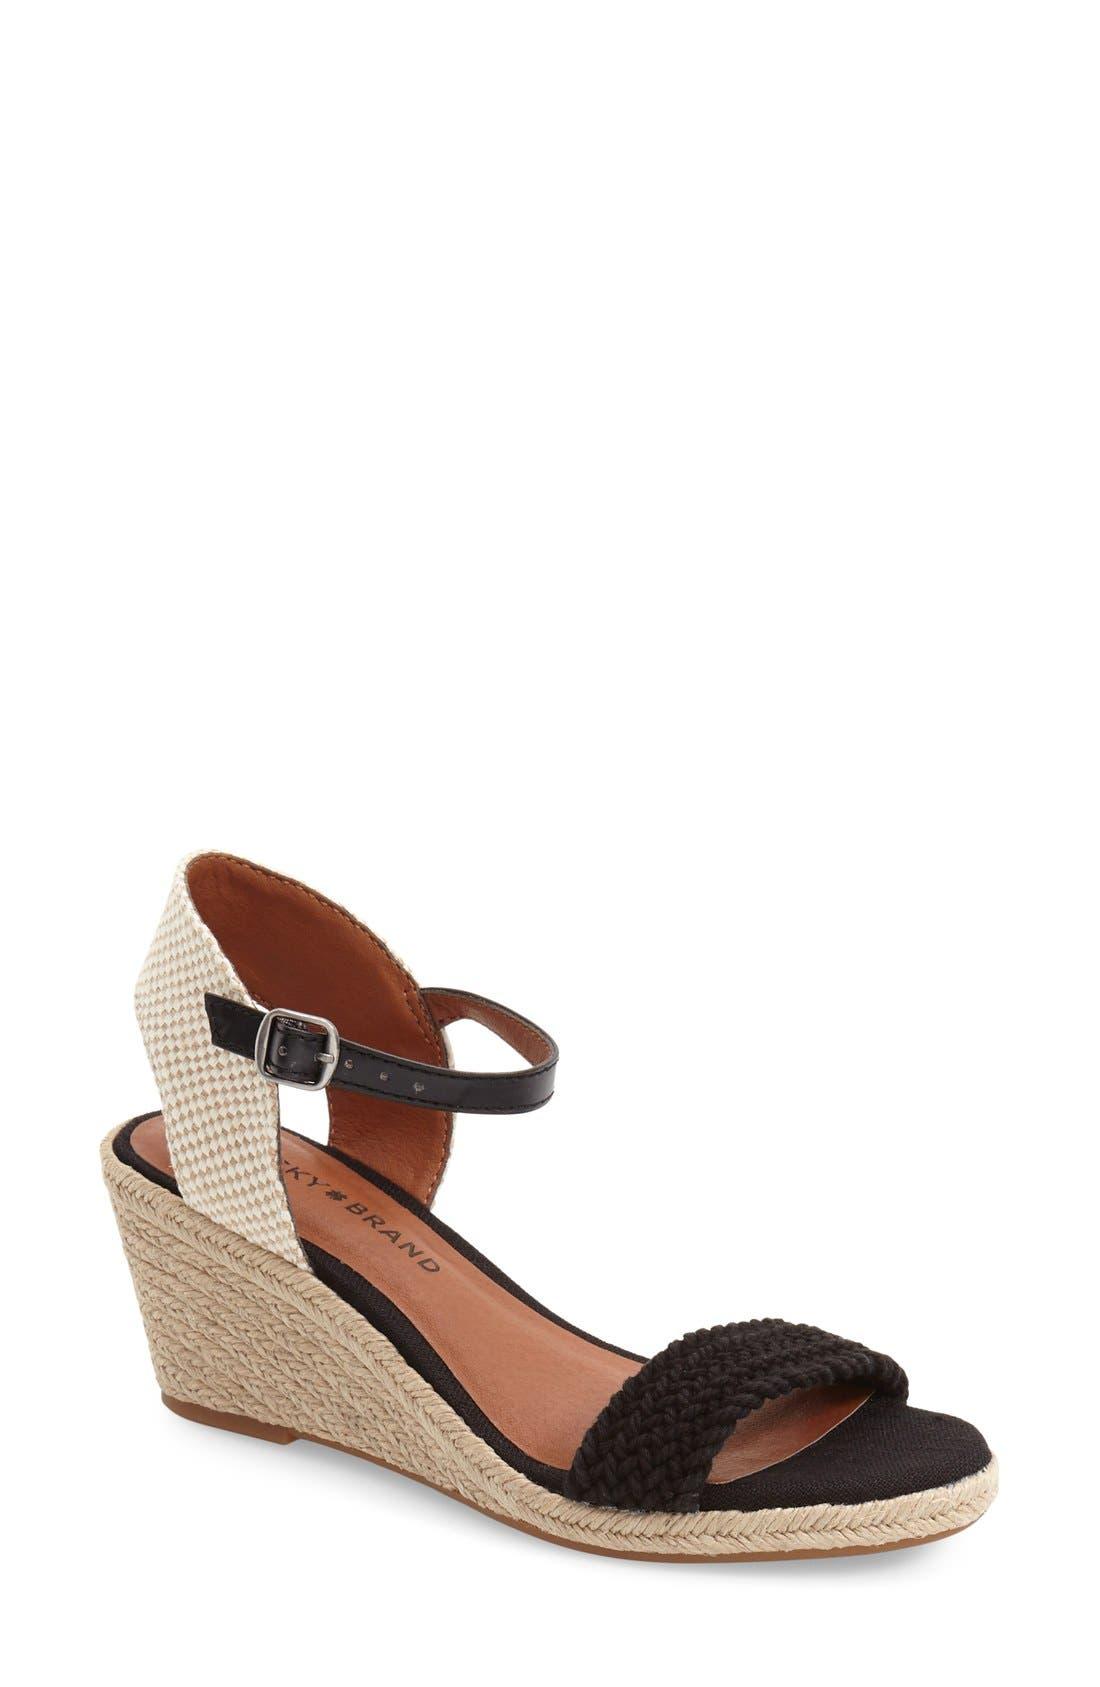 'Katereena' Wedge Sandal,                         Main,                         color, 001